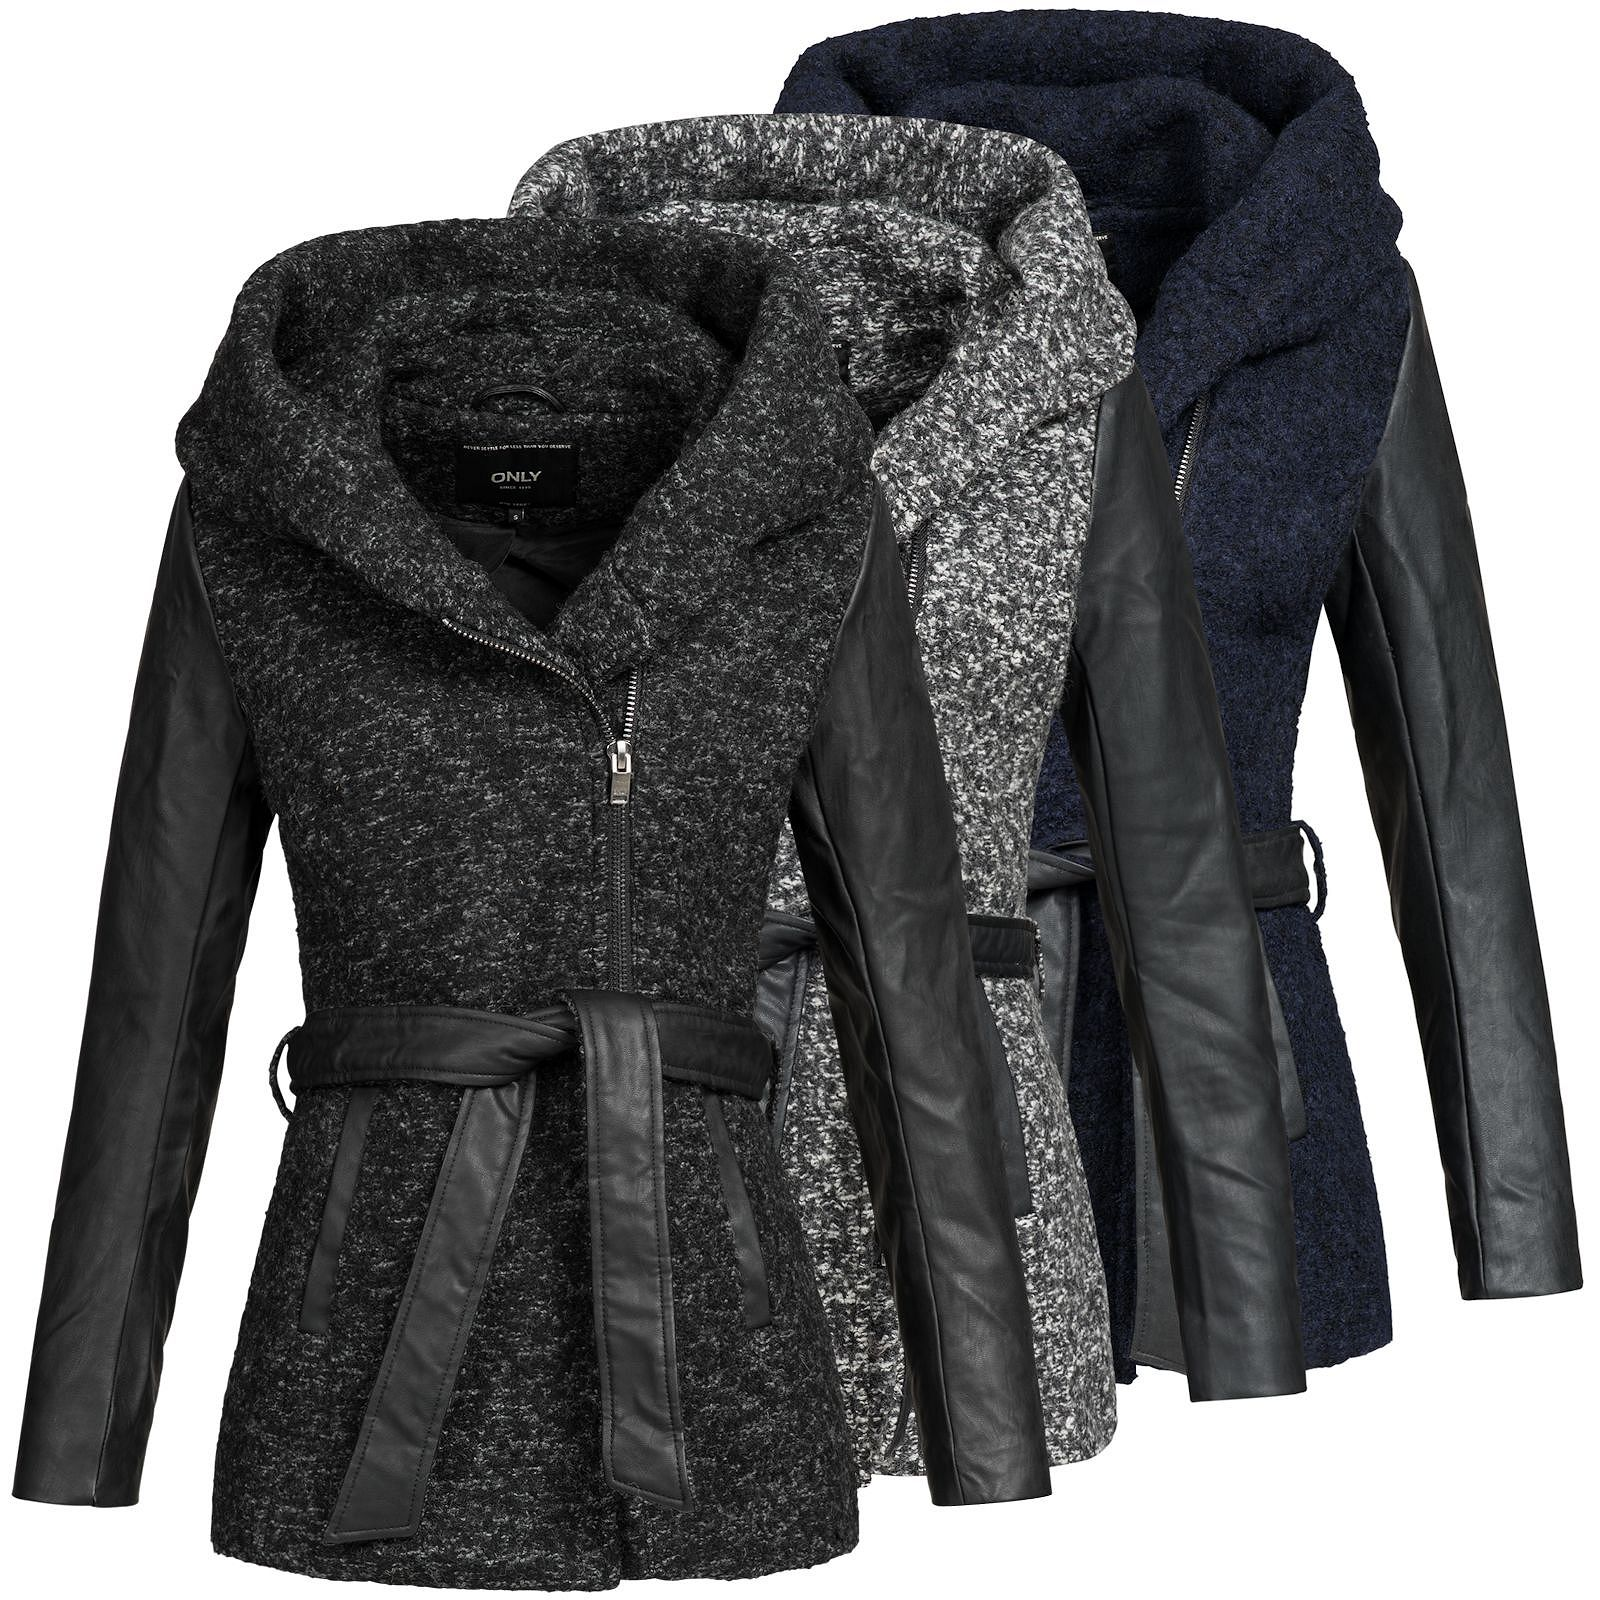 look out for uk store clearance prices Details zu Only Damen Mantel Jacke Parka Übergangsjacke Kurzmantel  Wollmantel Lisford